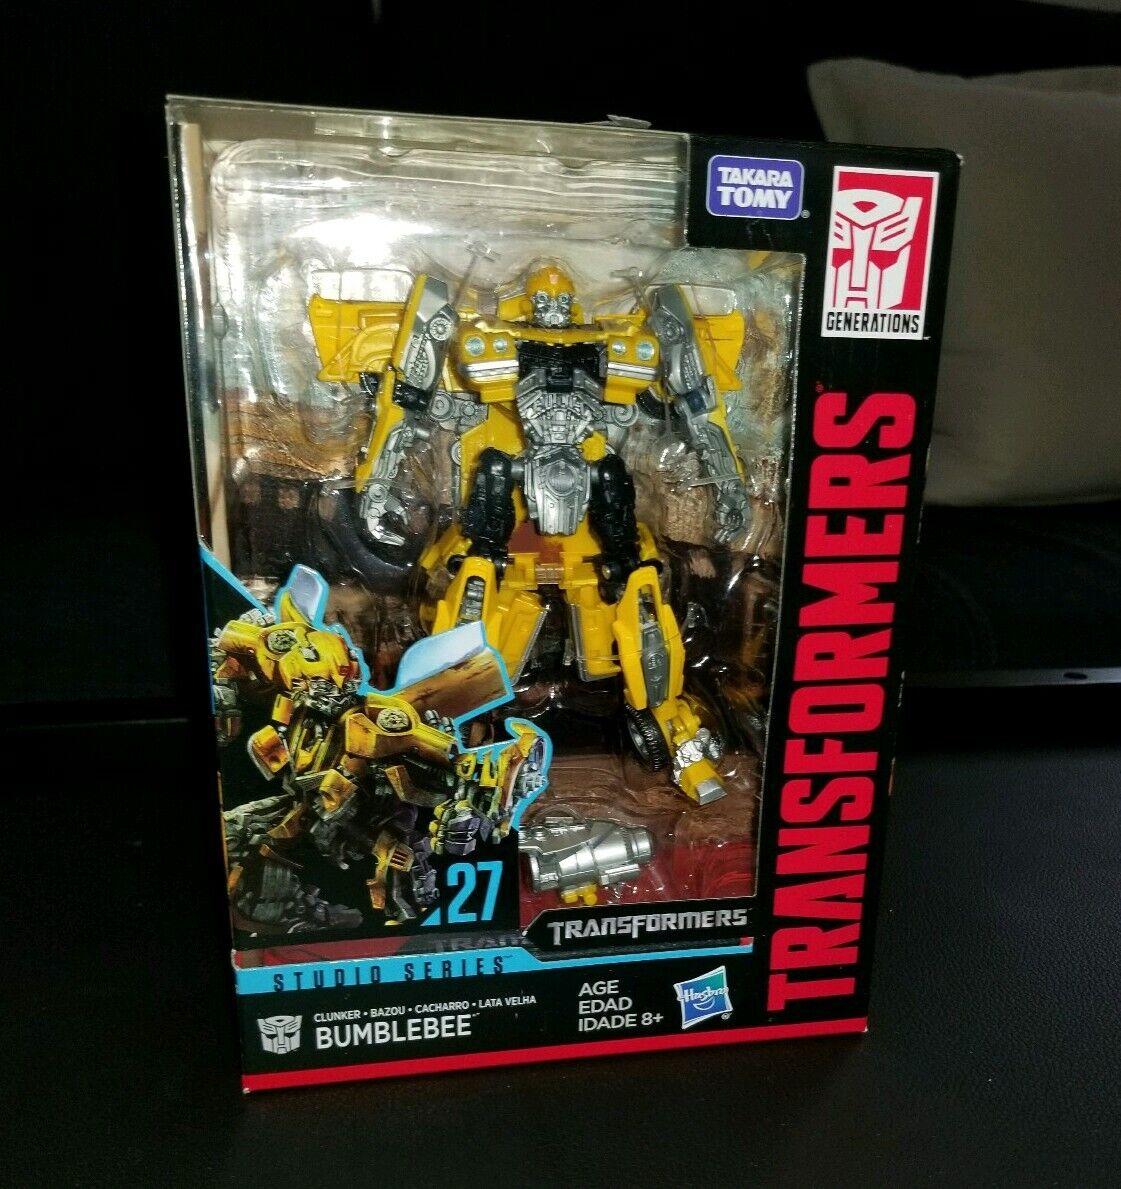 Bumblebee Transformers Studio Series Deluxe Class Action Figure new in box